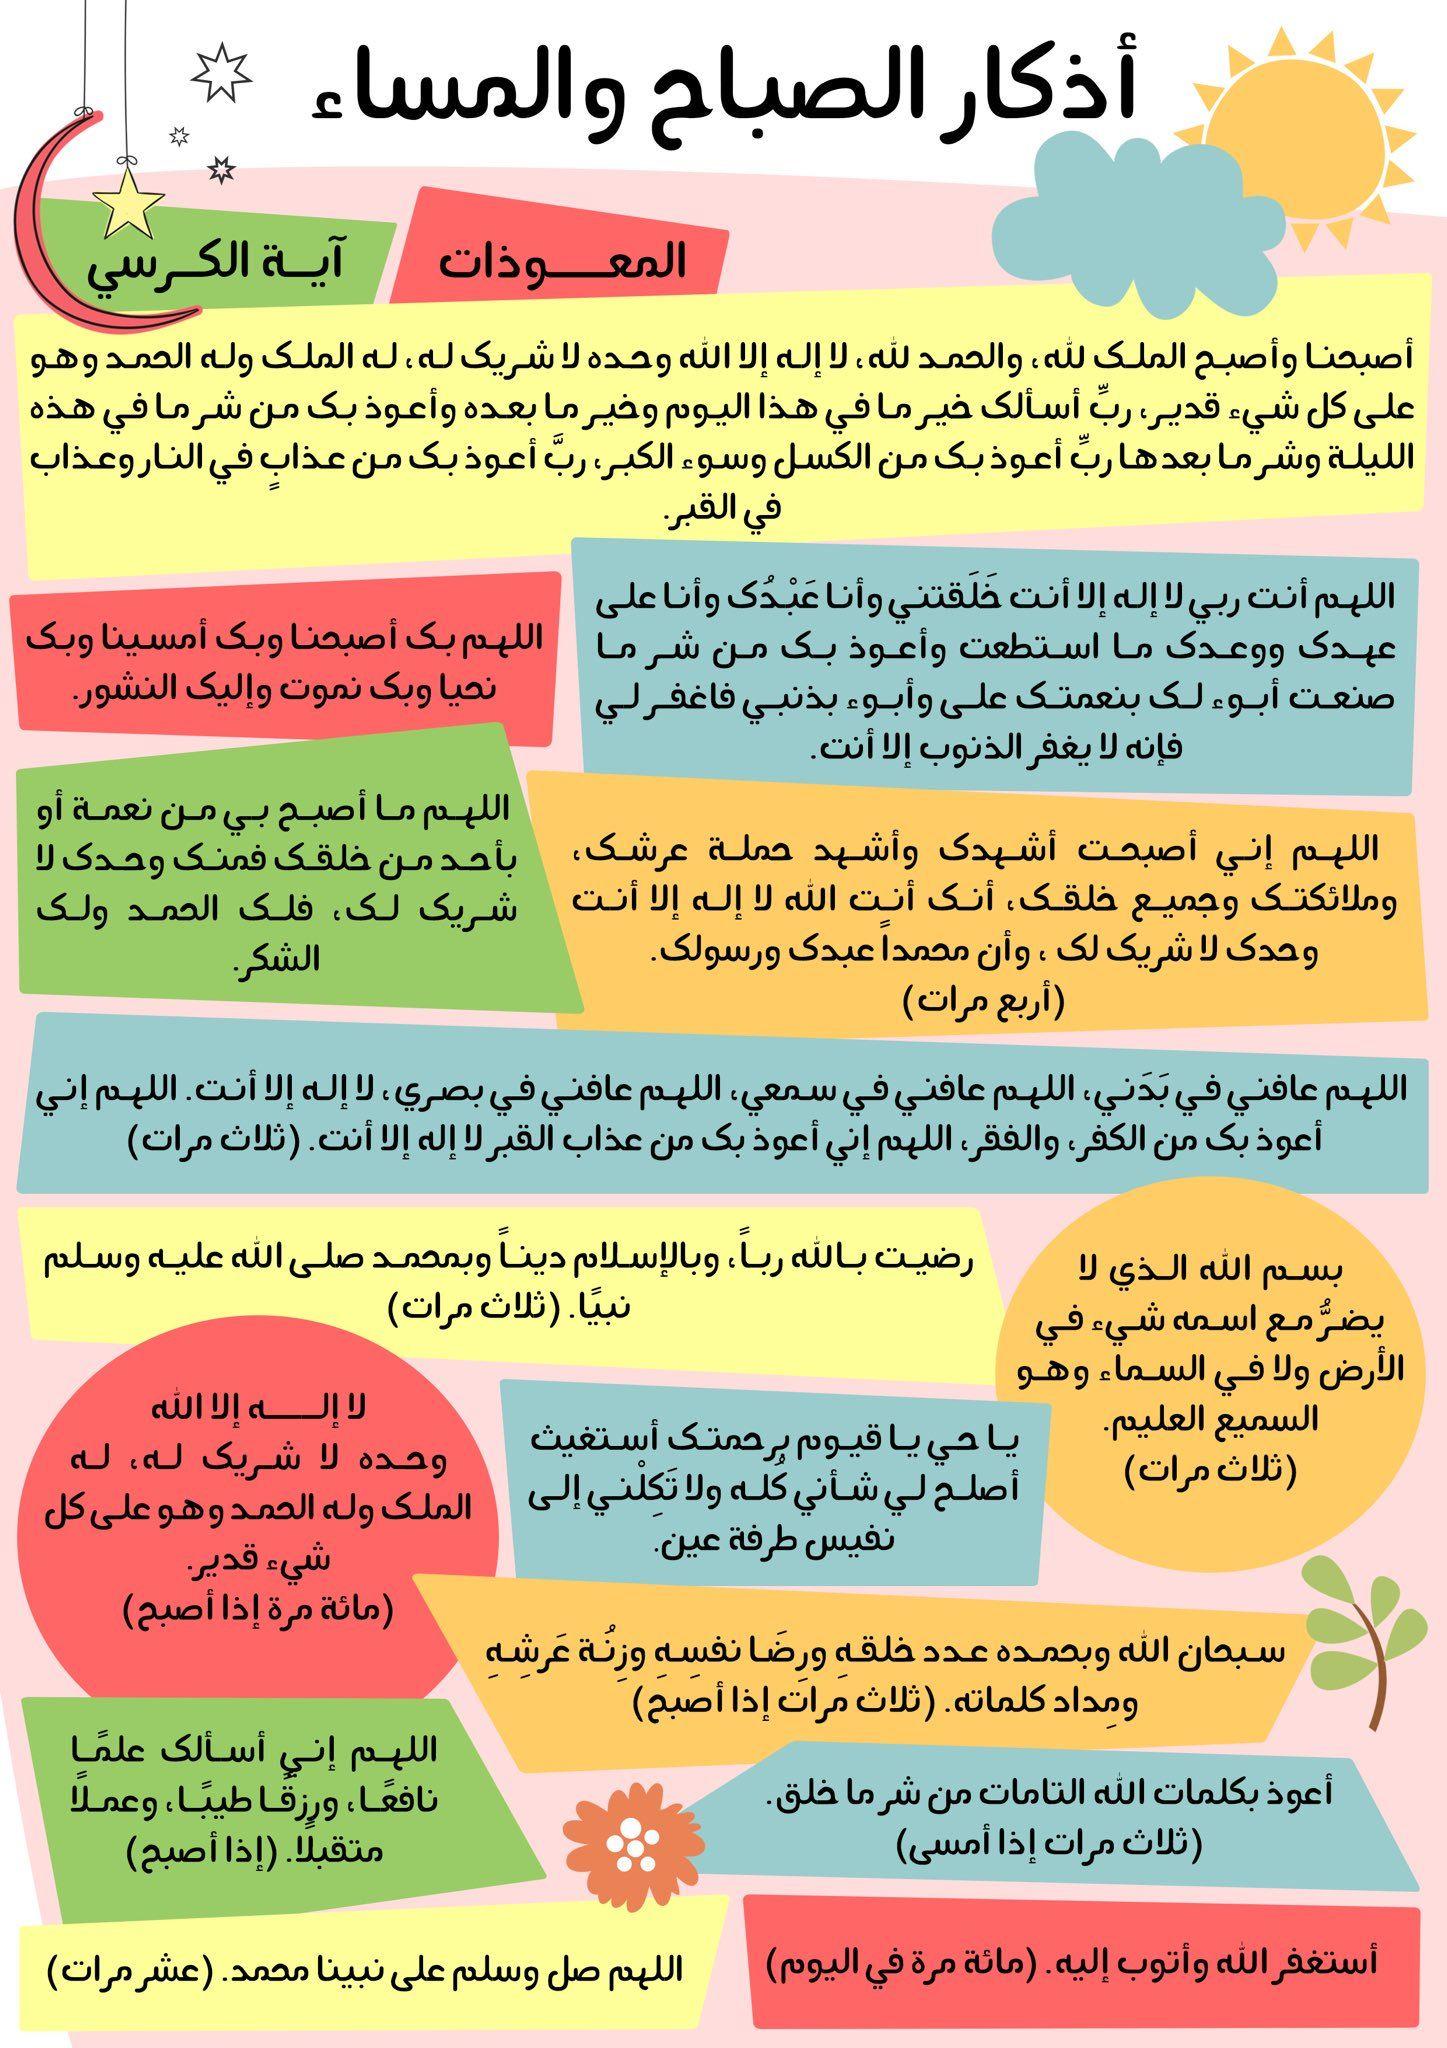 الش روق Alshor تويتر Islam Facts Islamic Inspirational Quotes Quran Quotes Love